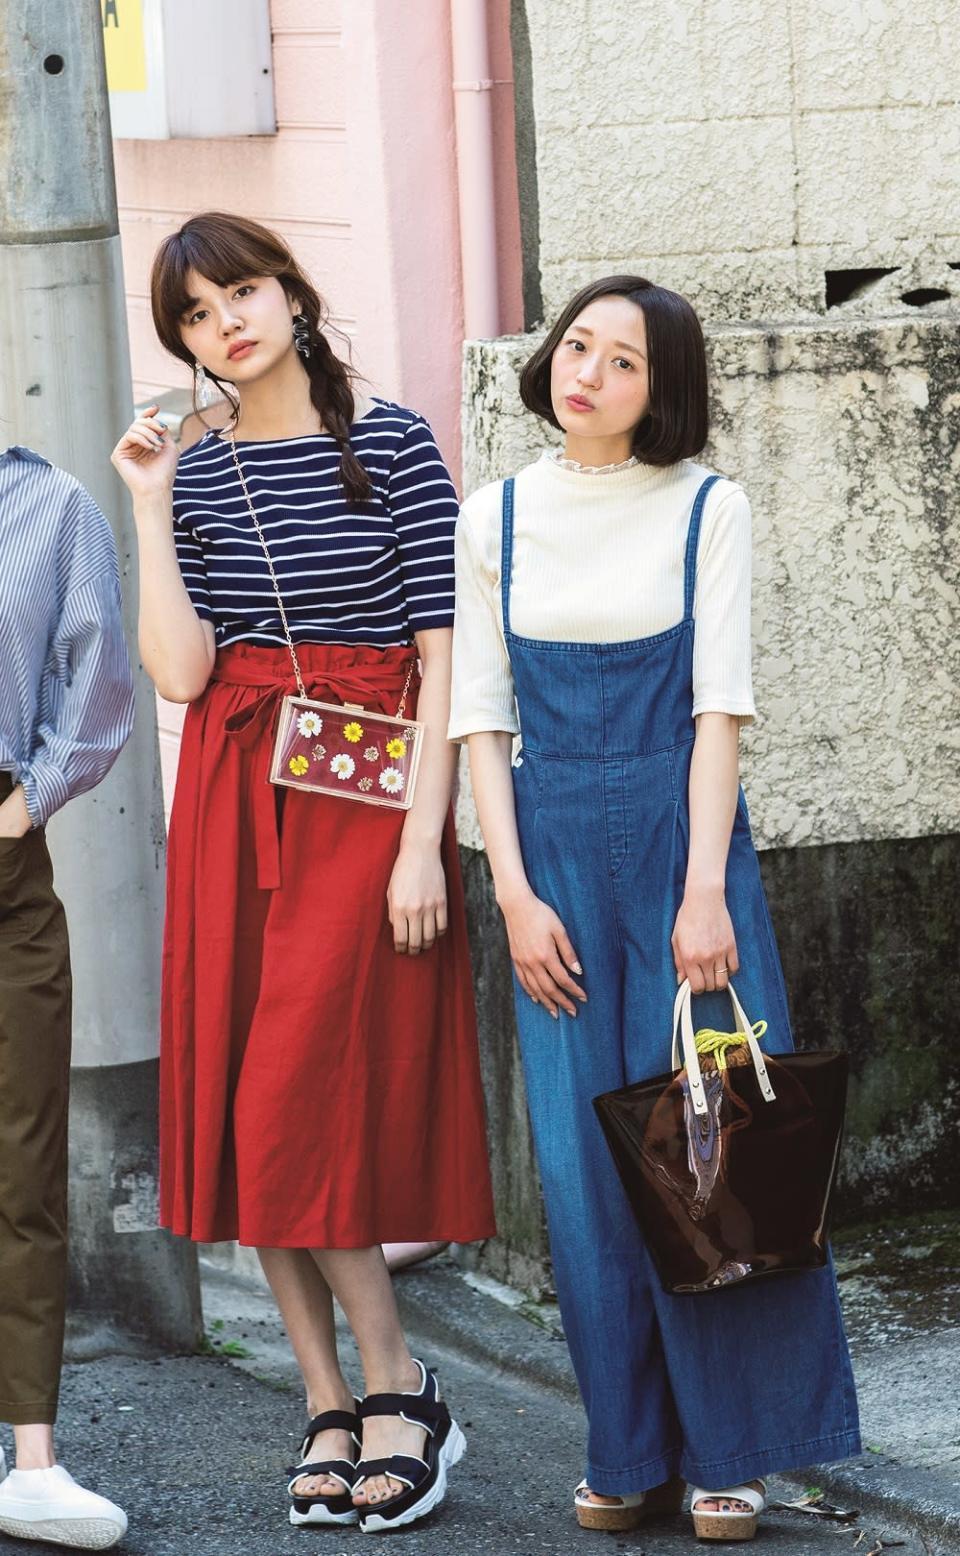 yuzu-collection-content-2998-1531277084.